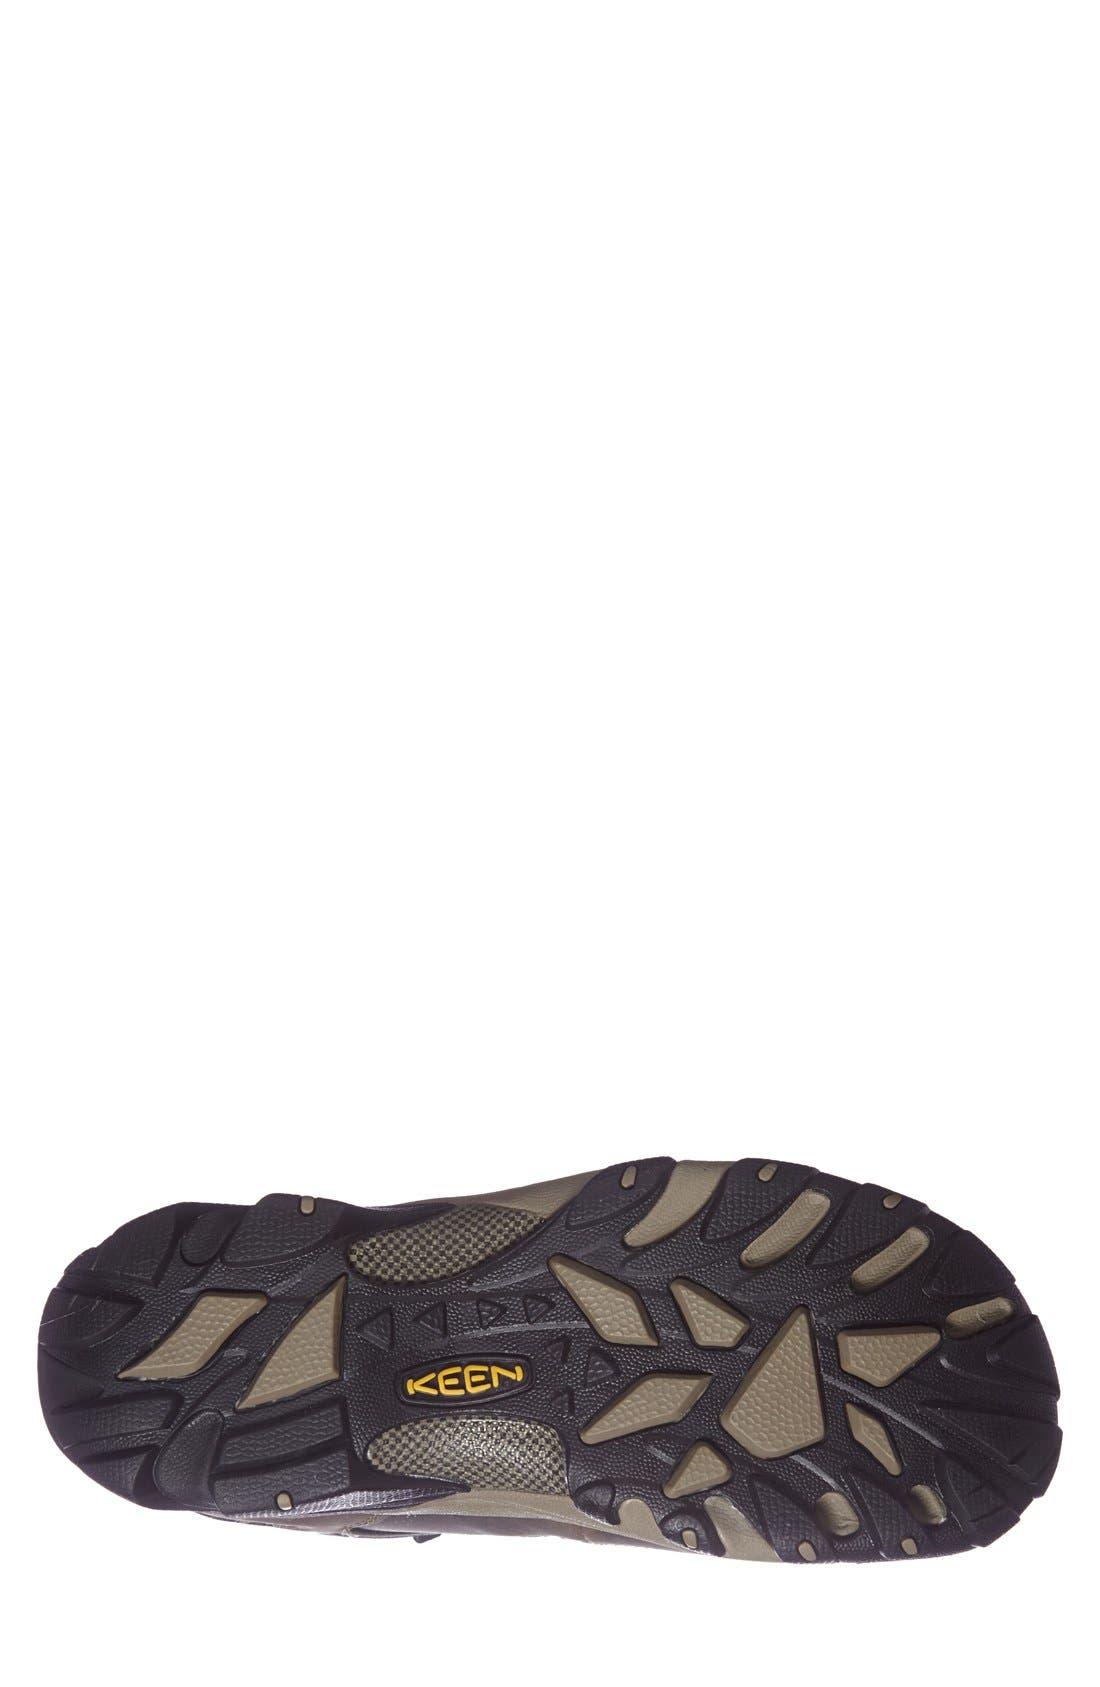 Targhee II Mid Hiking Waterproof Boot,                             Alternate thumbnail 4, color,                             SHITAKE/ BRINDLE